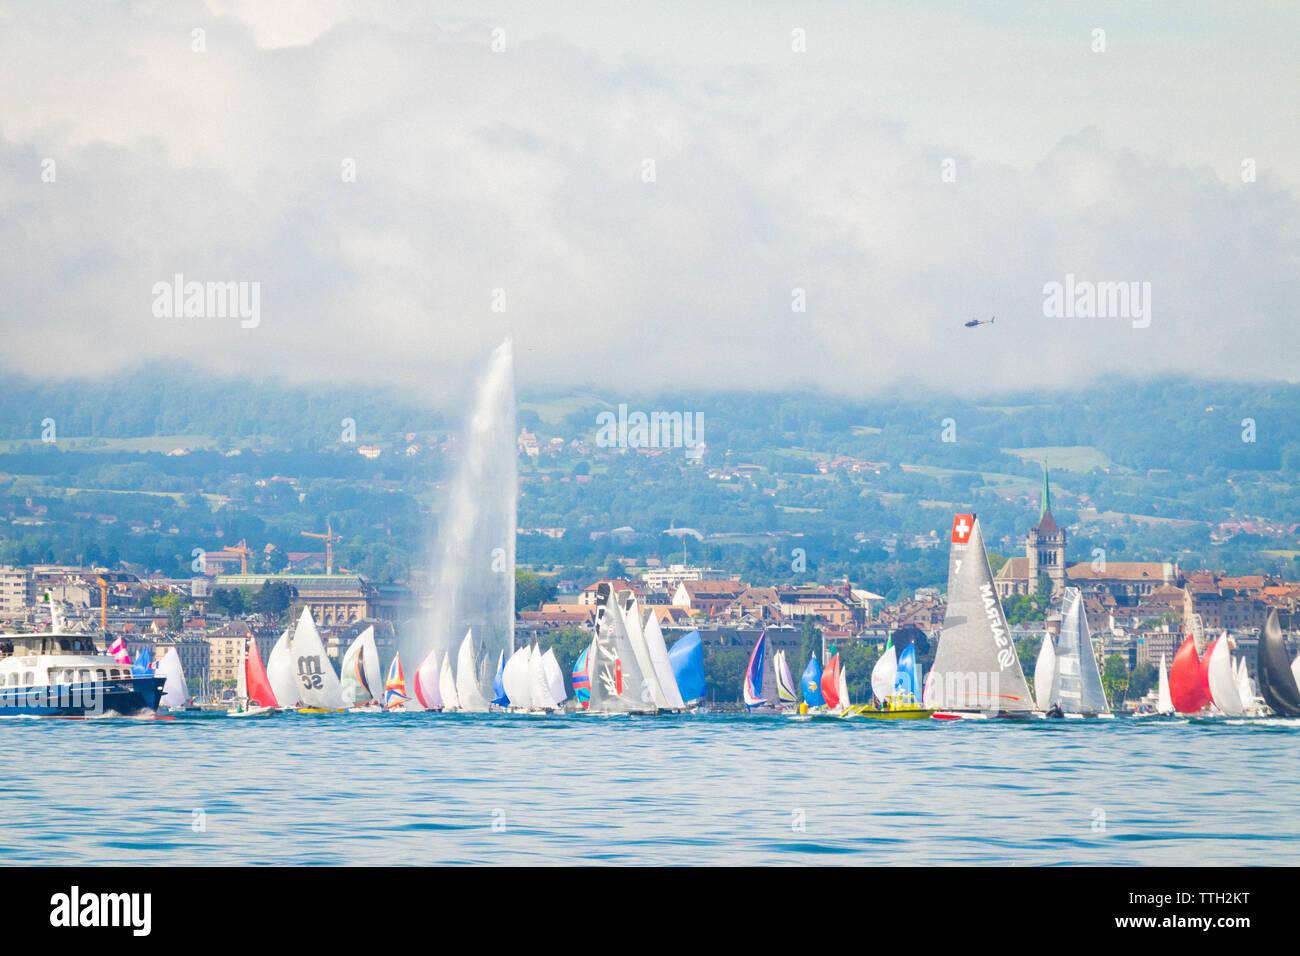 Sailing boat during Bol d'or the biggest regatta on Lake leman Geneva - Stock Image